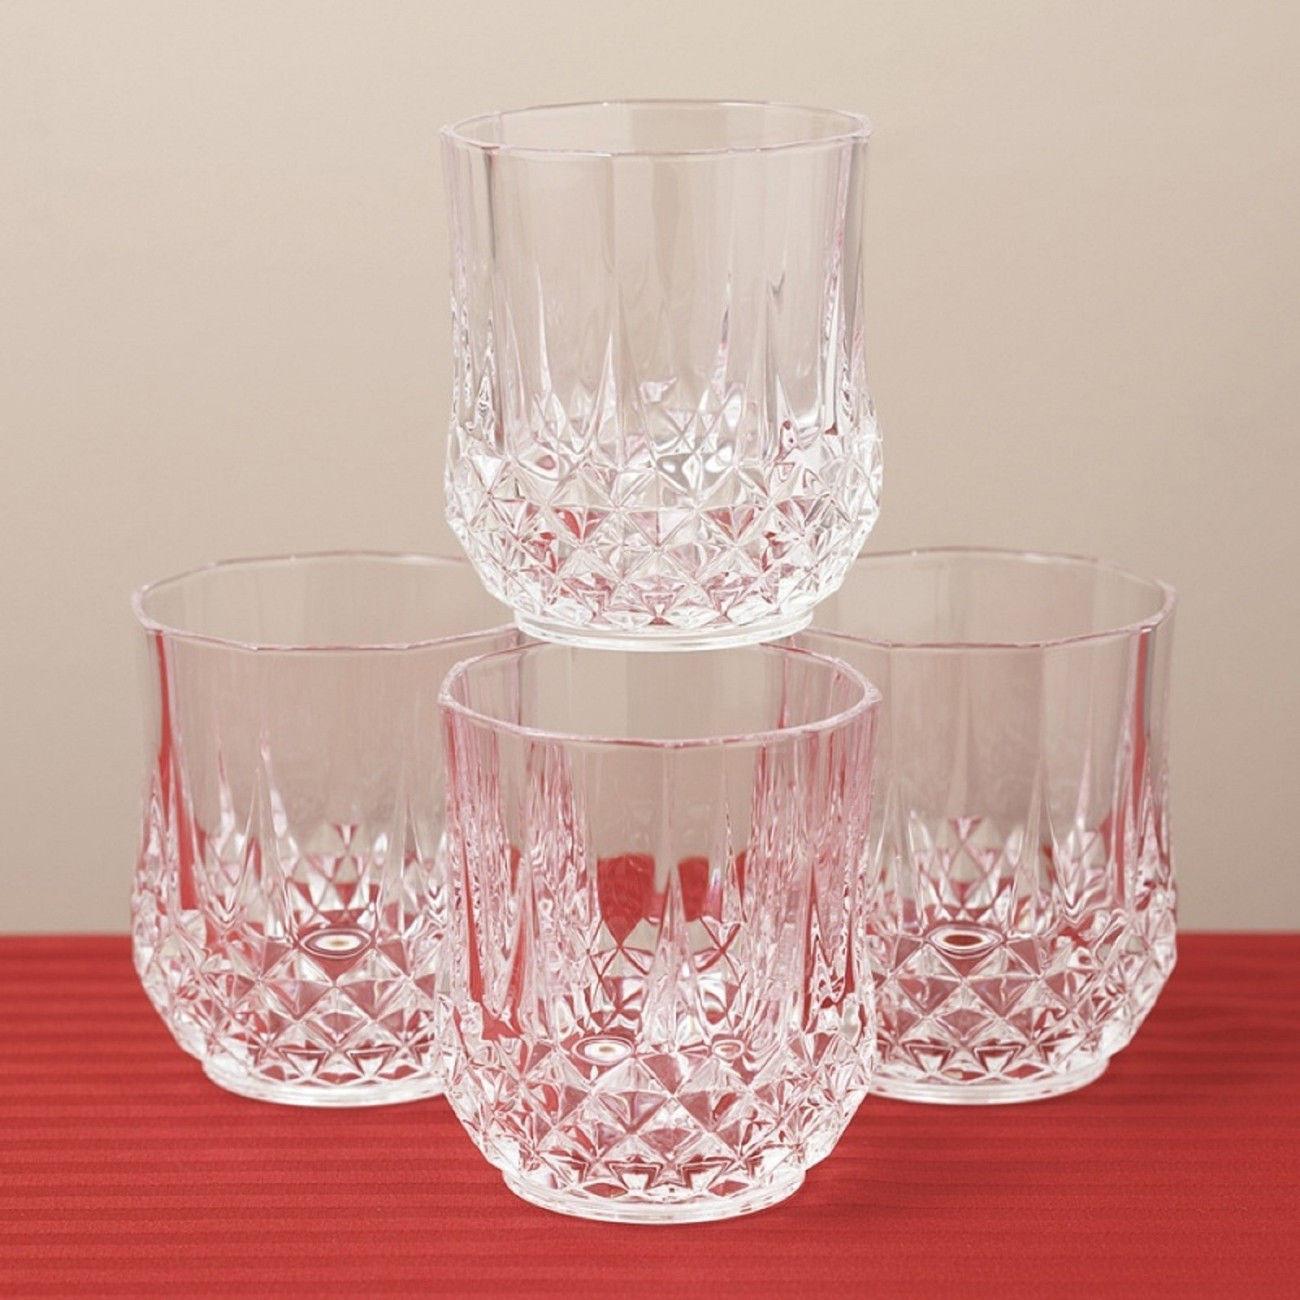 cristal d 39 arques longchamp juice glass 1 listing. Black Bedroom Furniture Sets. Home Design Ideas